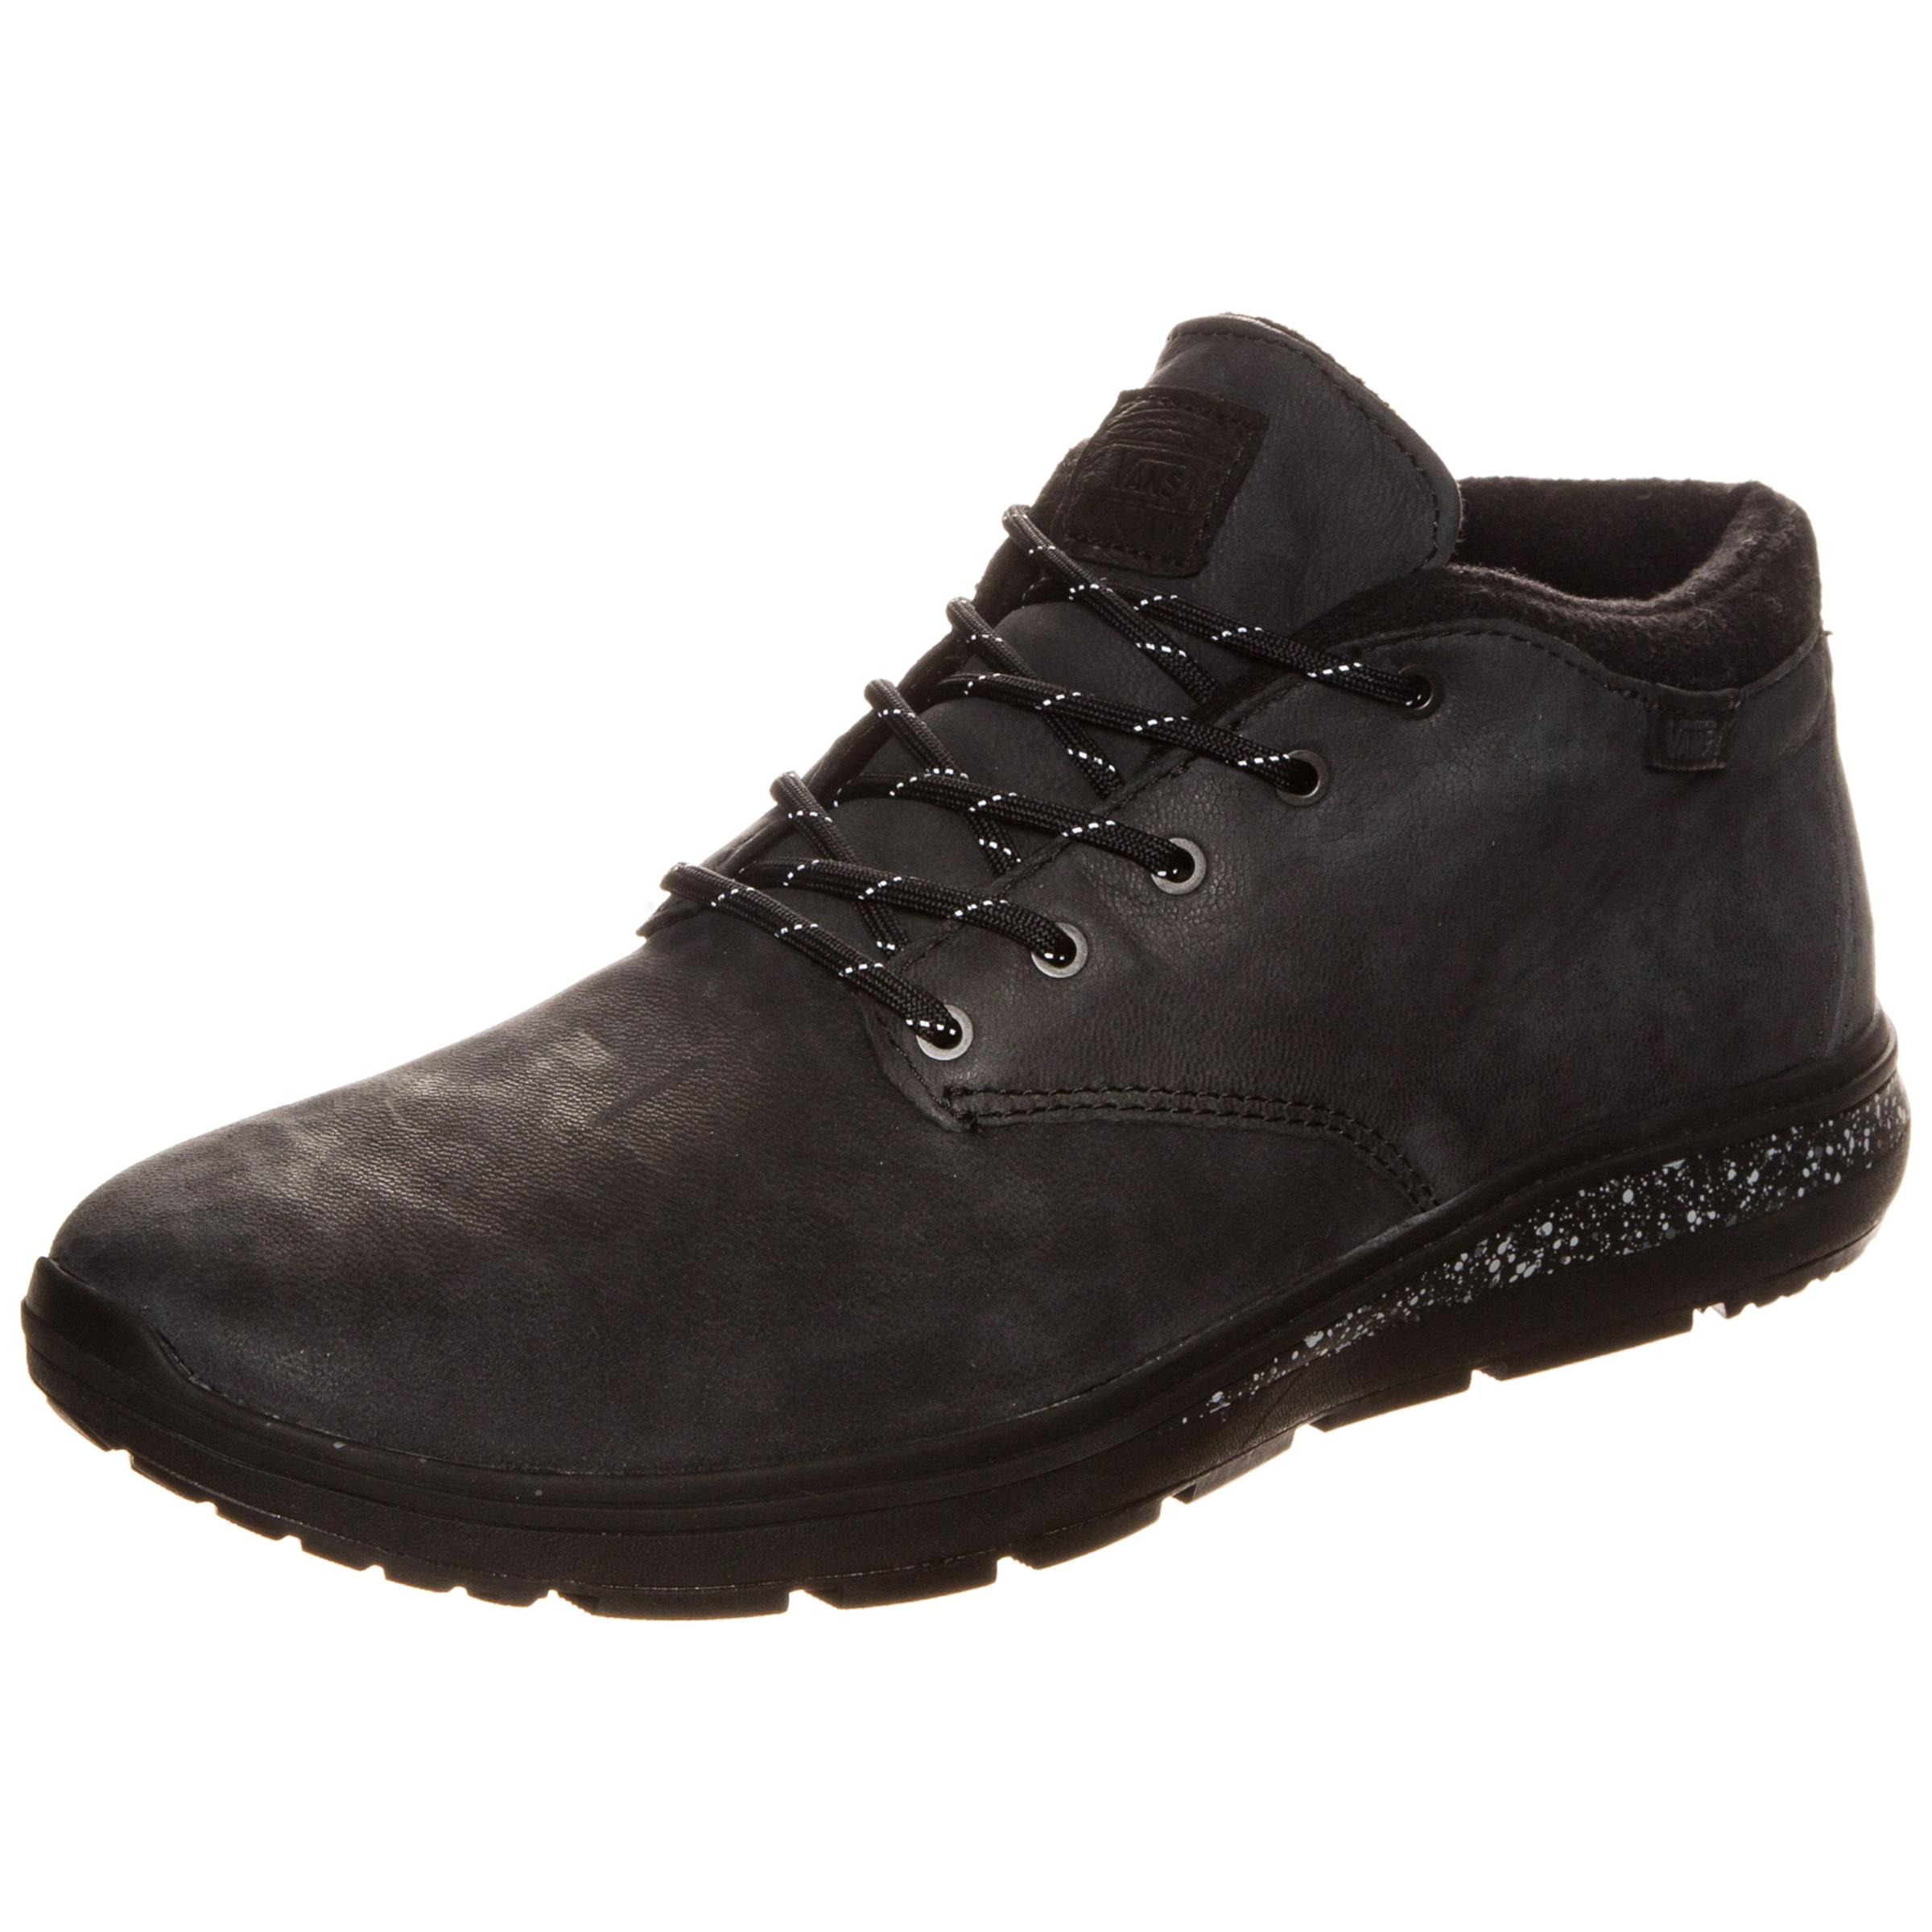 VANS Iso 3 Mid Sneaker